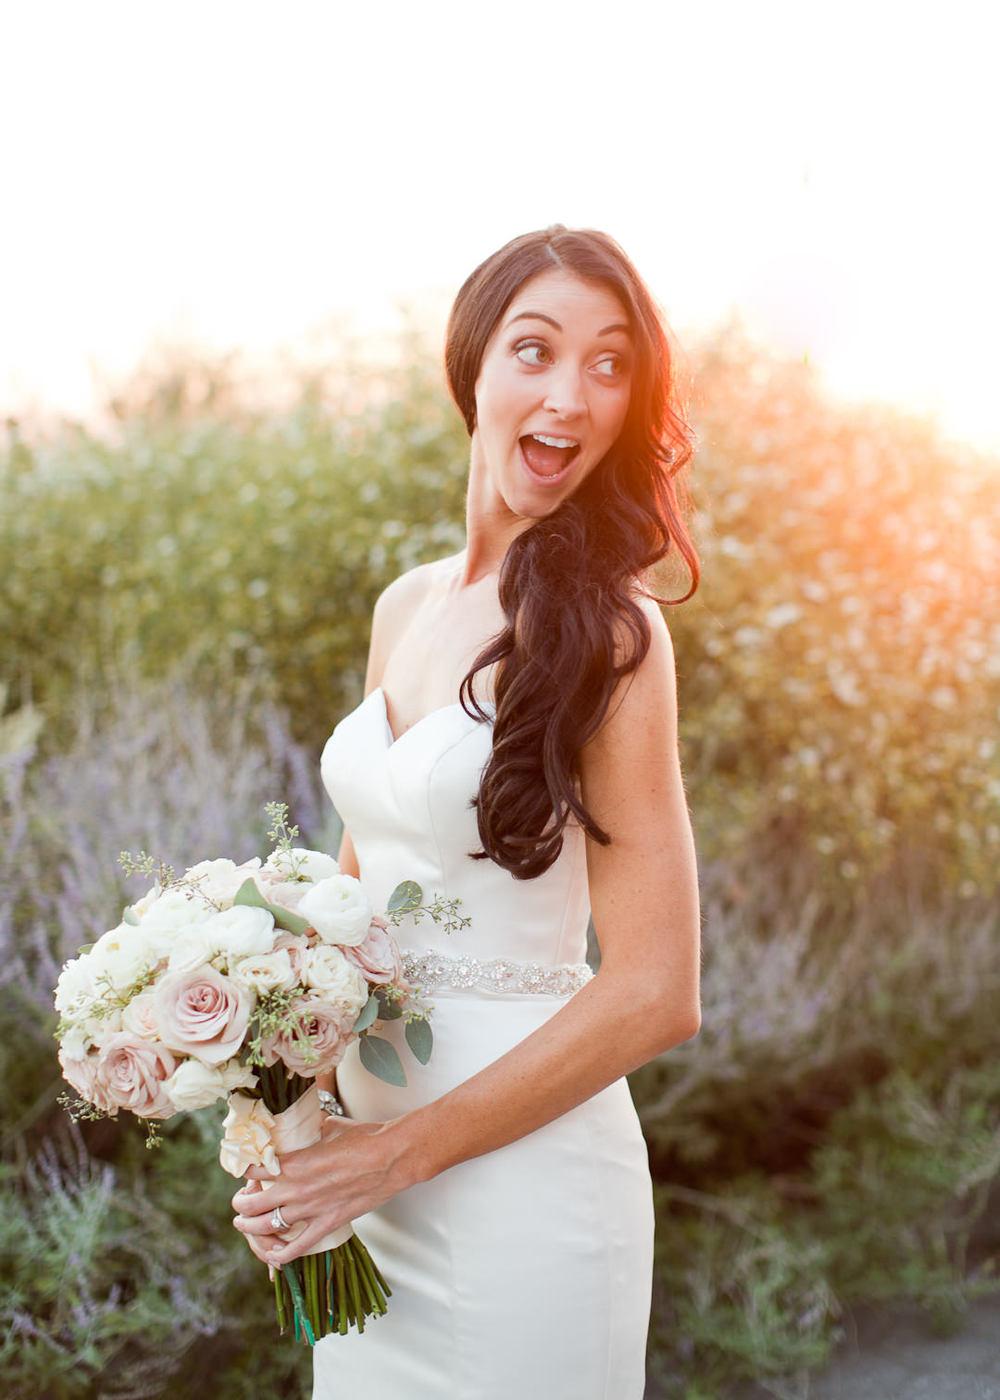 Melissa Kruse Photography - Adriana & James Battery Gardens New York City Wedding-761.jpg